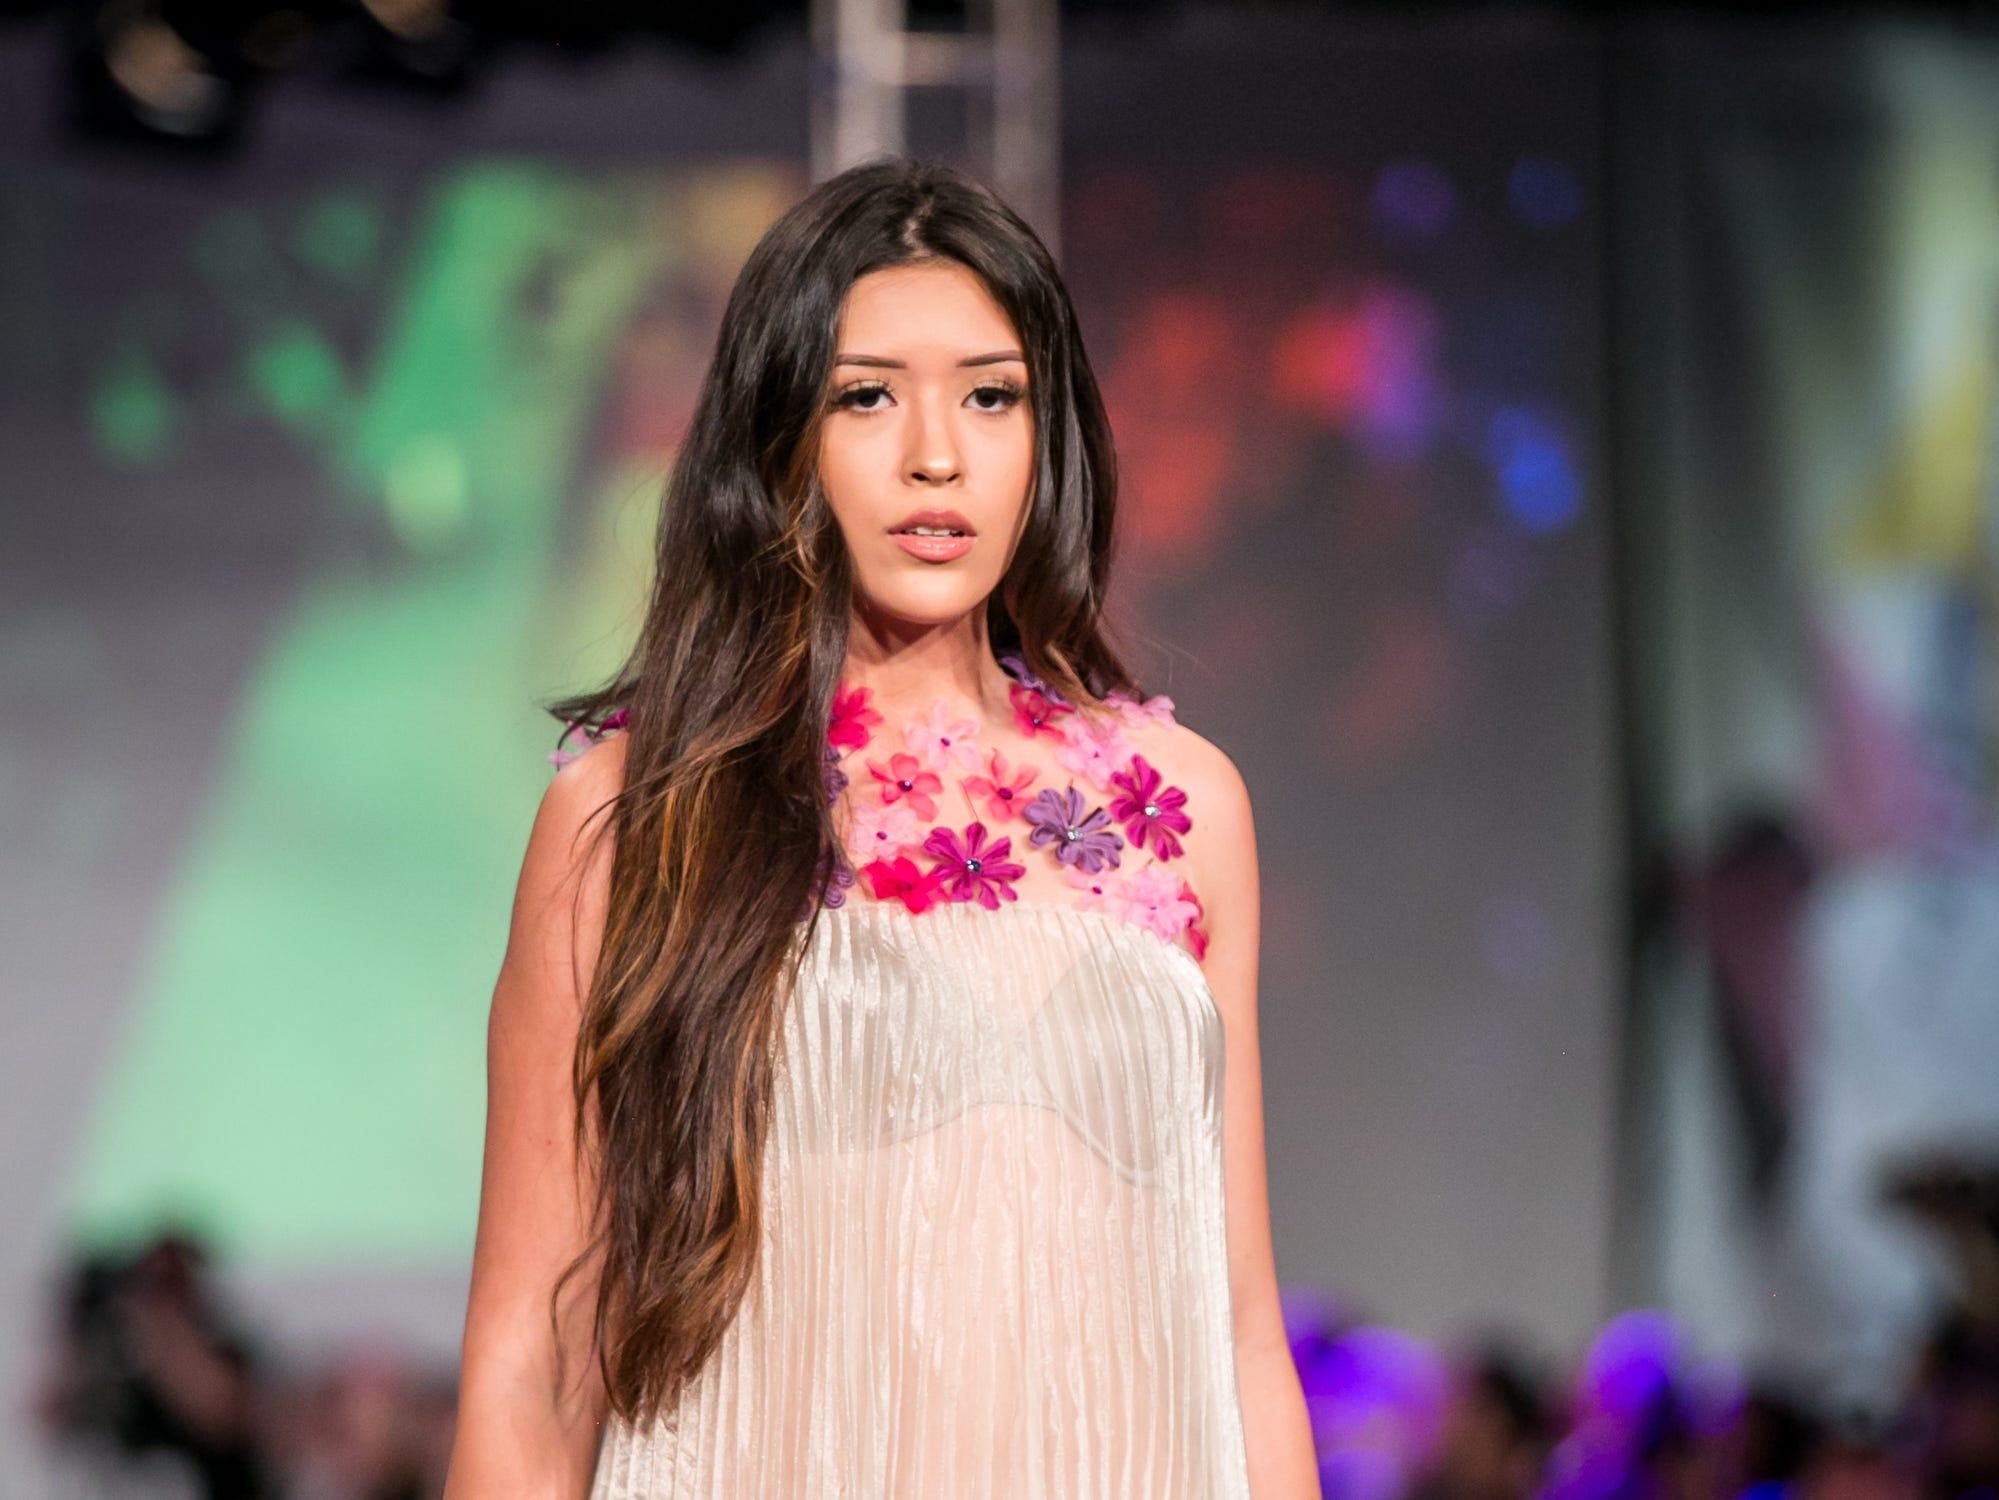 Orlando Dugi's runway during Phoenix Fashion Week at Talking Stick Resort in Scottsdale on Saturday, October 20, 2018.